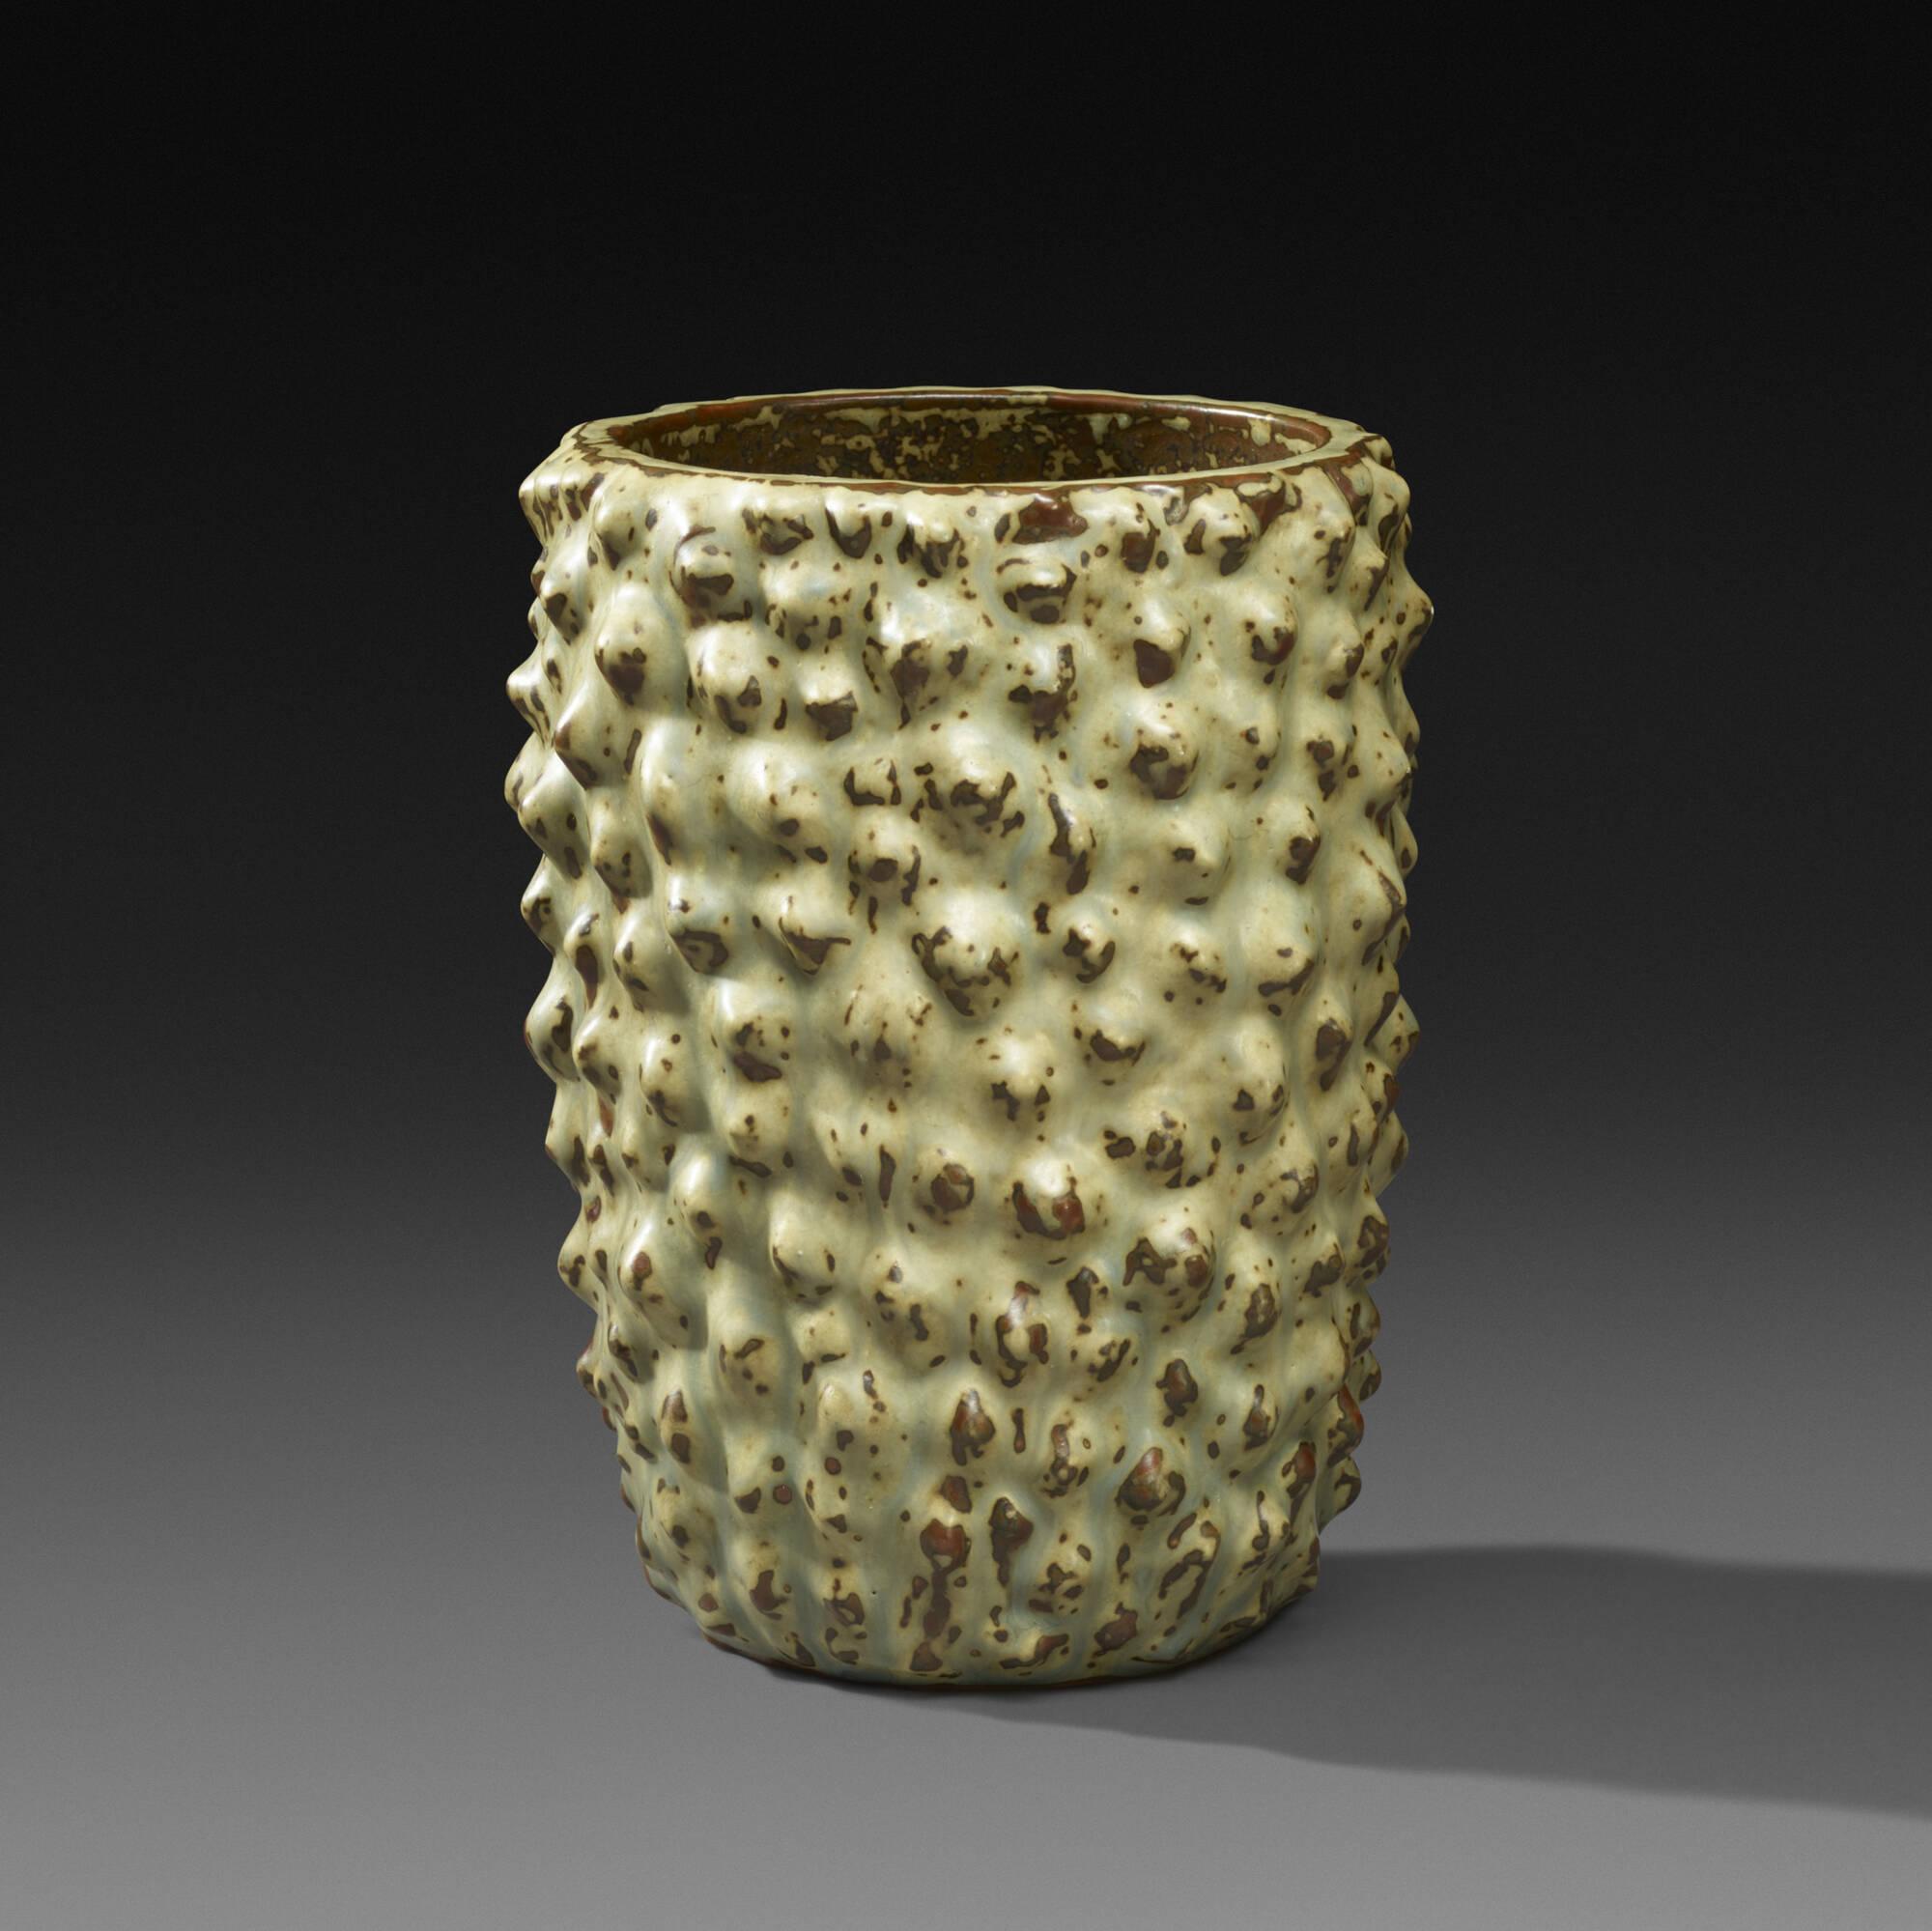 143: Axel Salto / Budding vase (1 of 4)